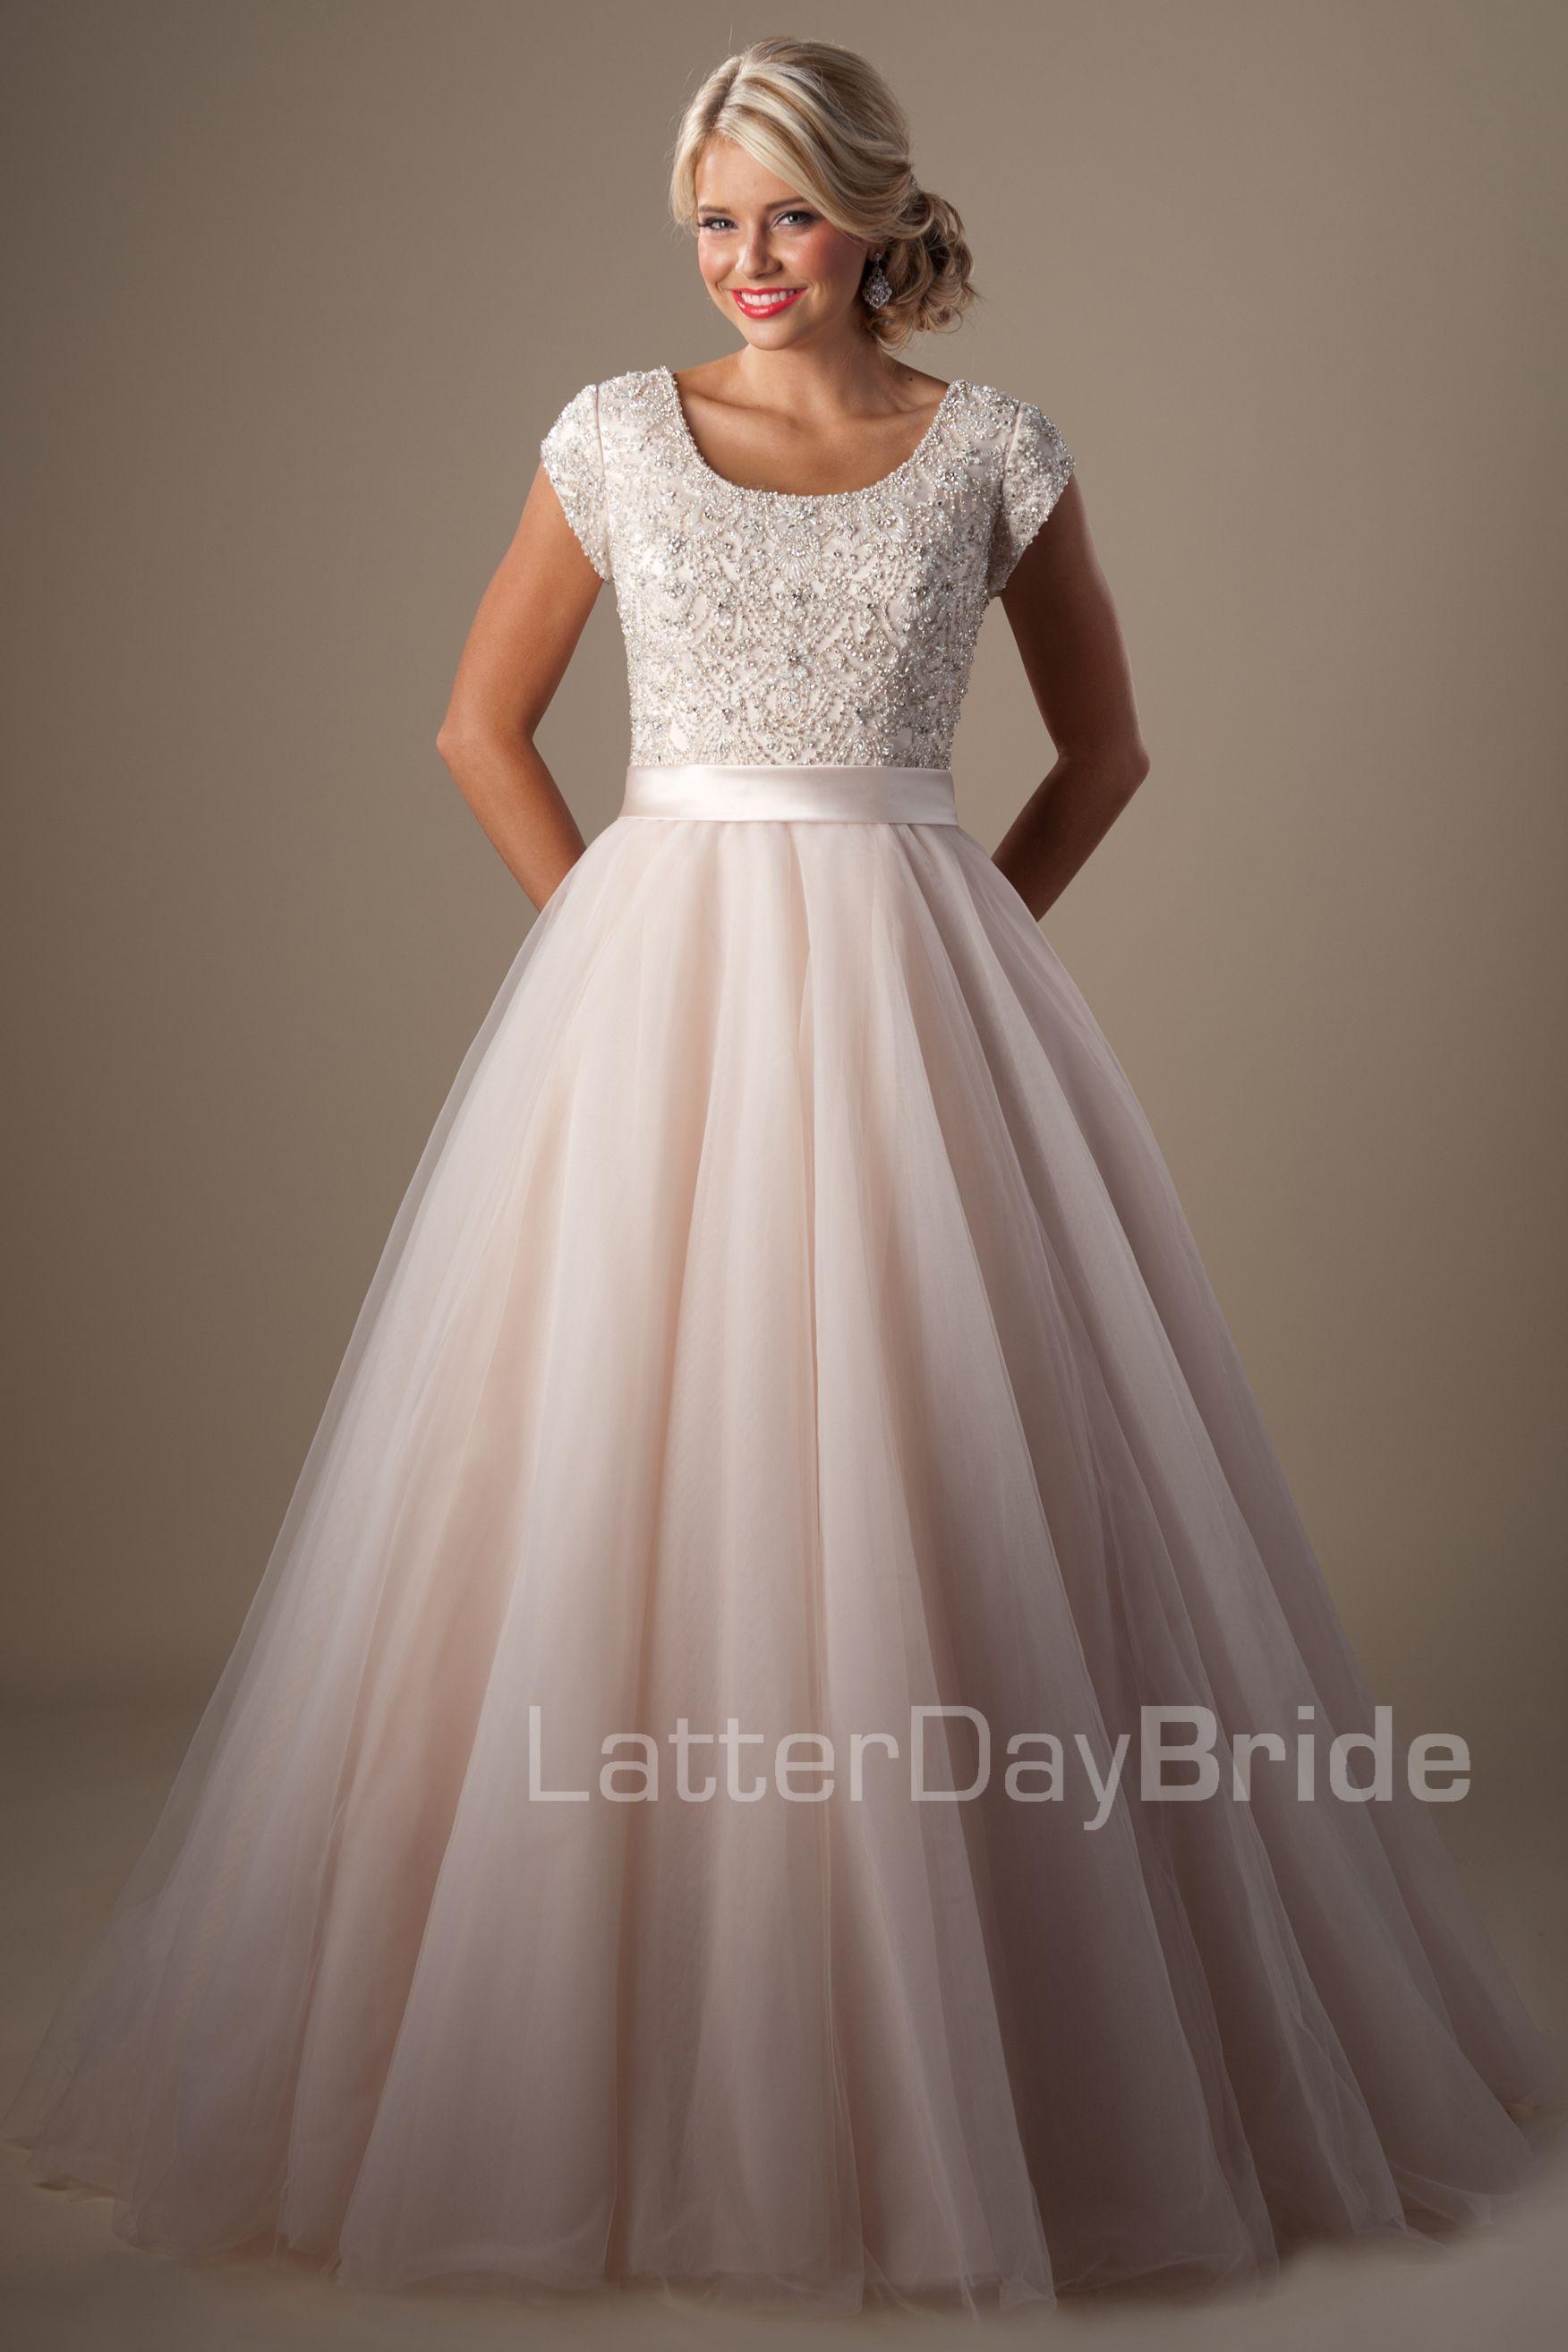 Best 10 Latter day bride ideas on Pinterest